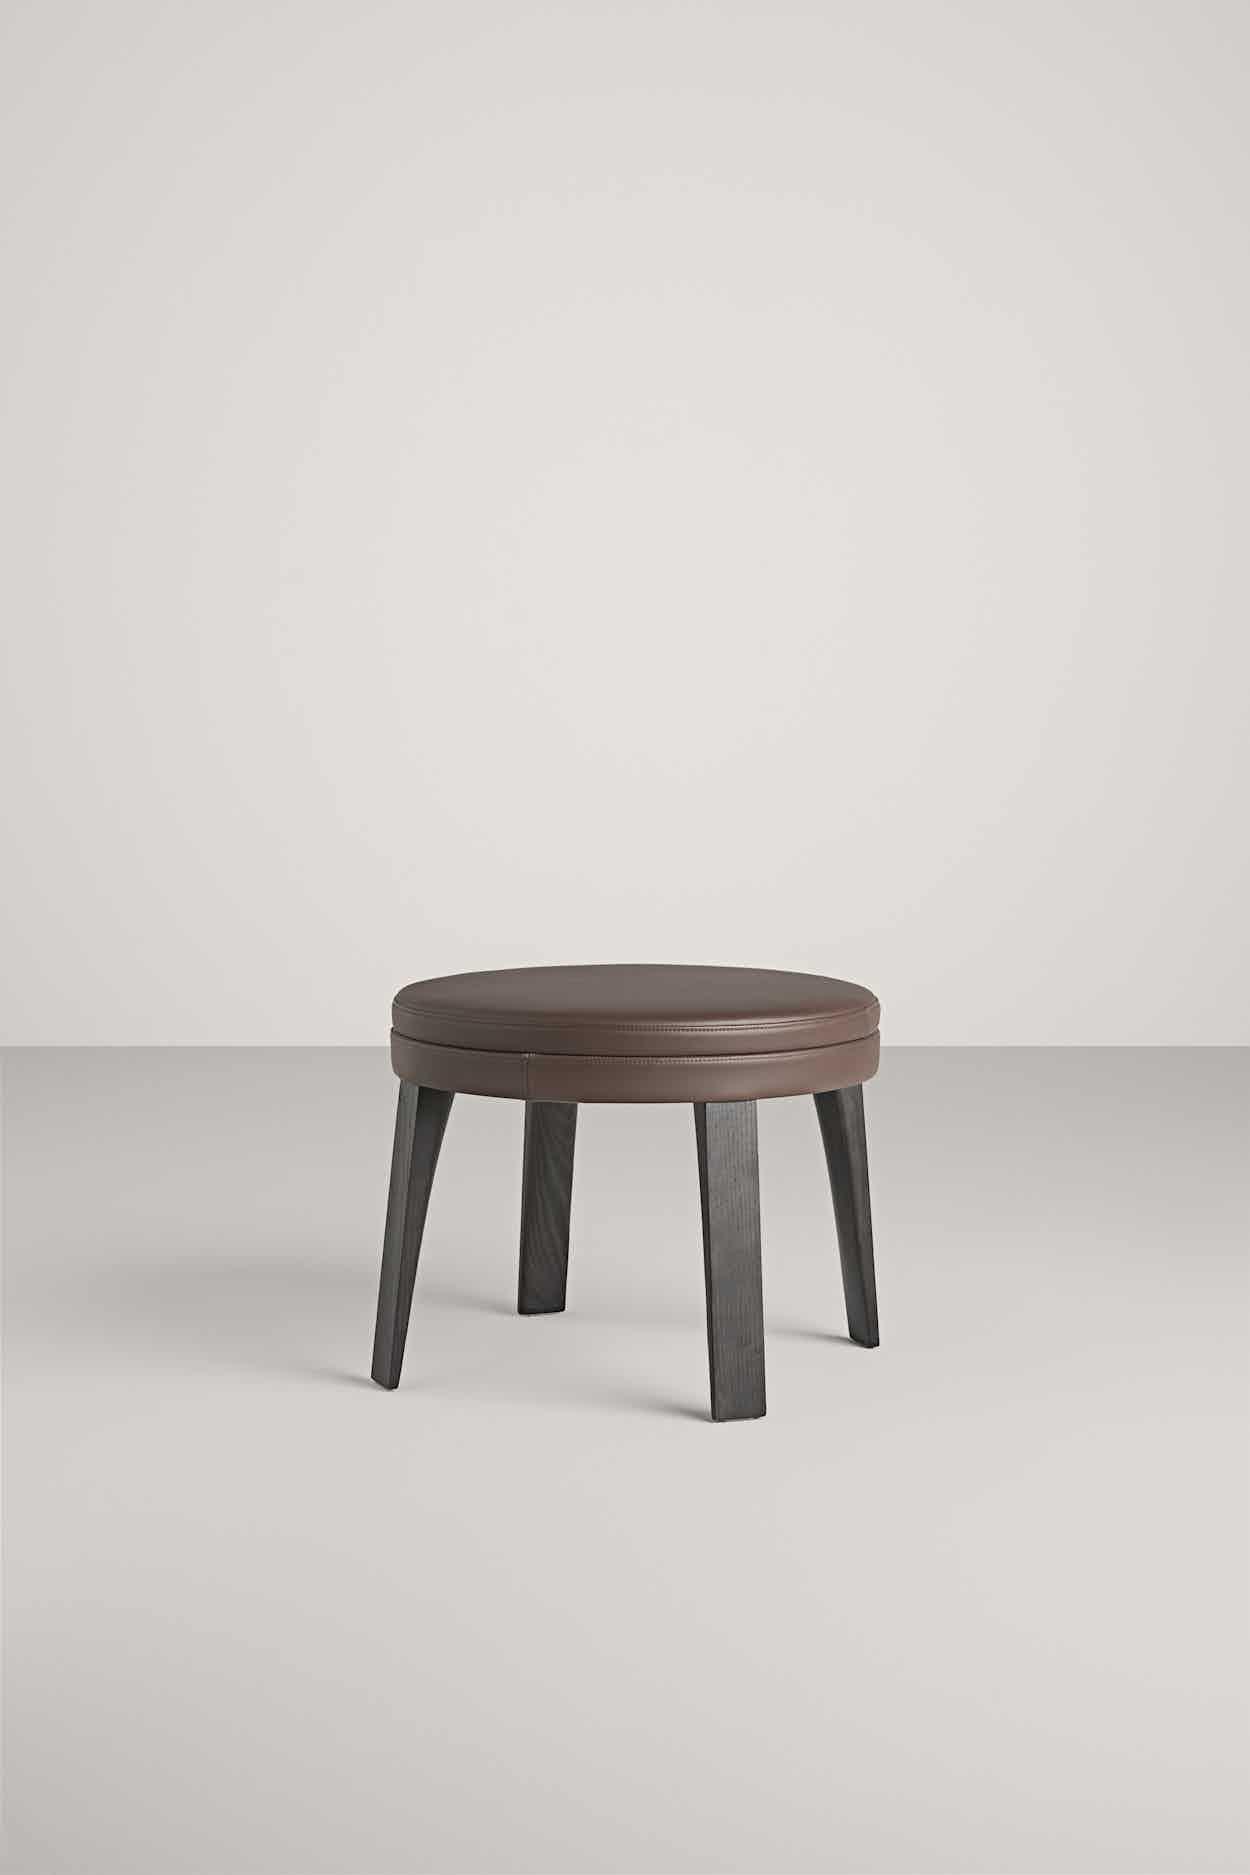 Frag-furniture-ponza-pouf-institu-haute-living